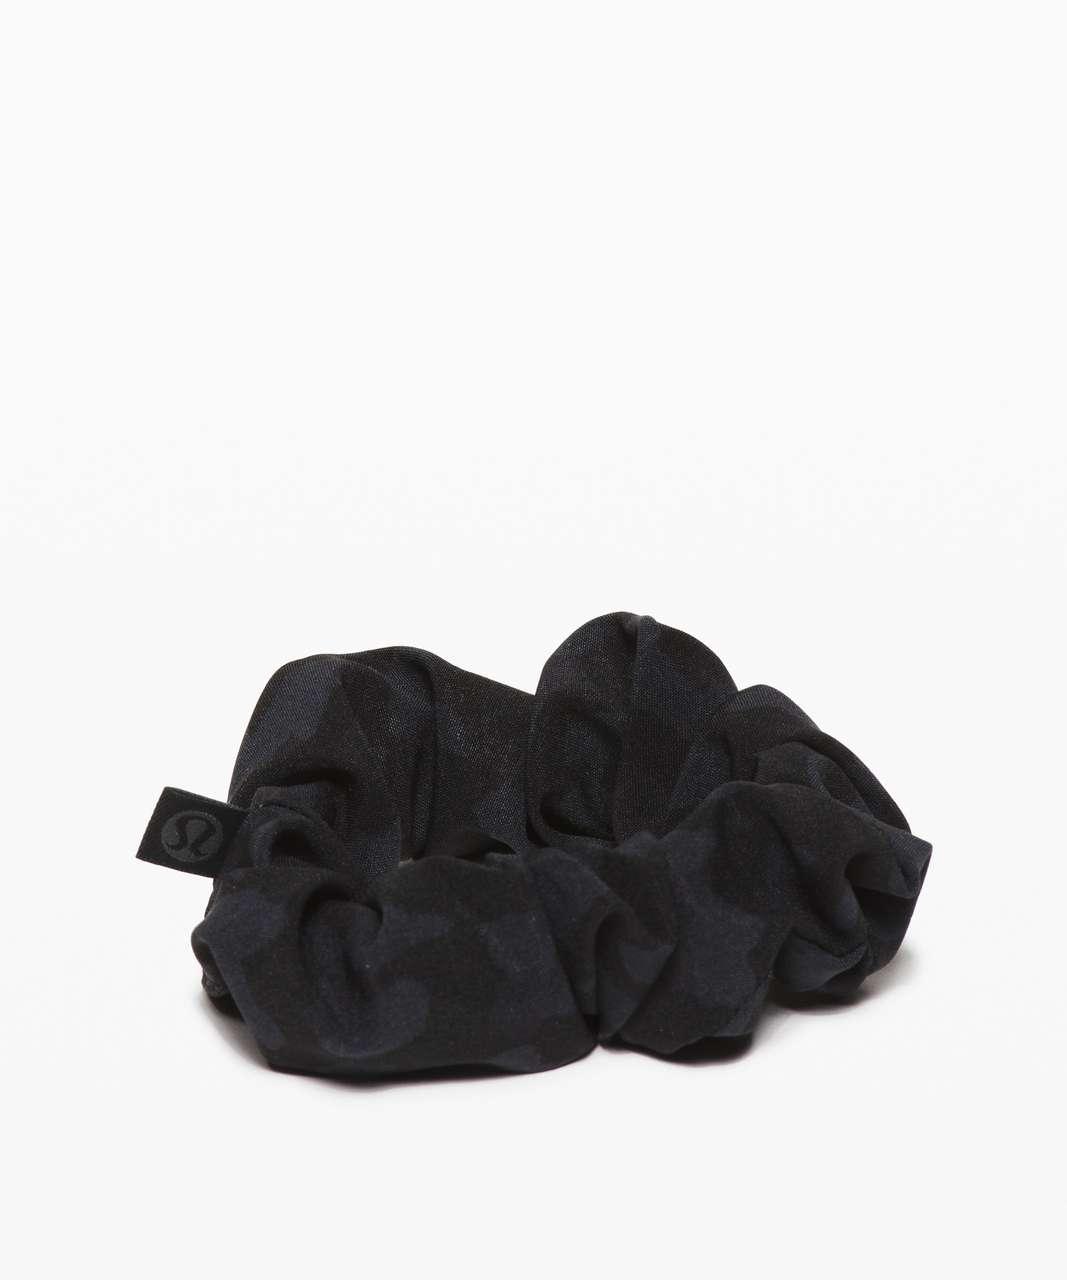 Lululemon Uplifting Scrunchie - Formation Camo Deep Coal Multi